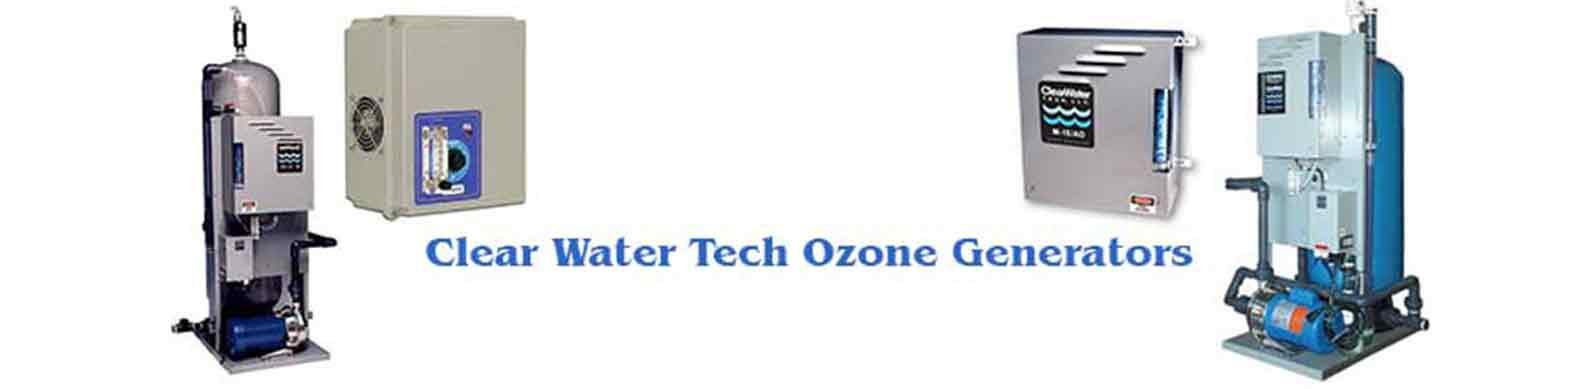 clear-water-techozone-generators-banner.jpg